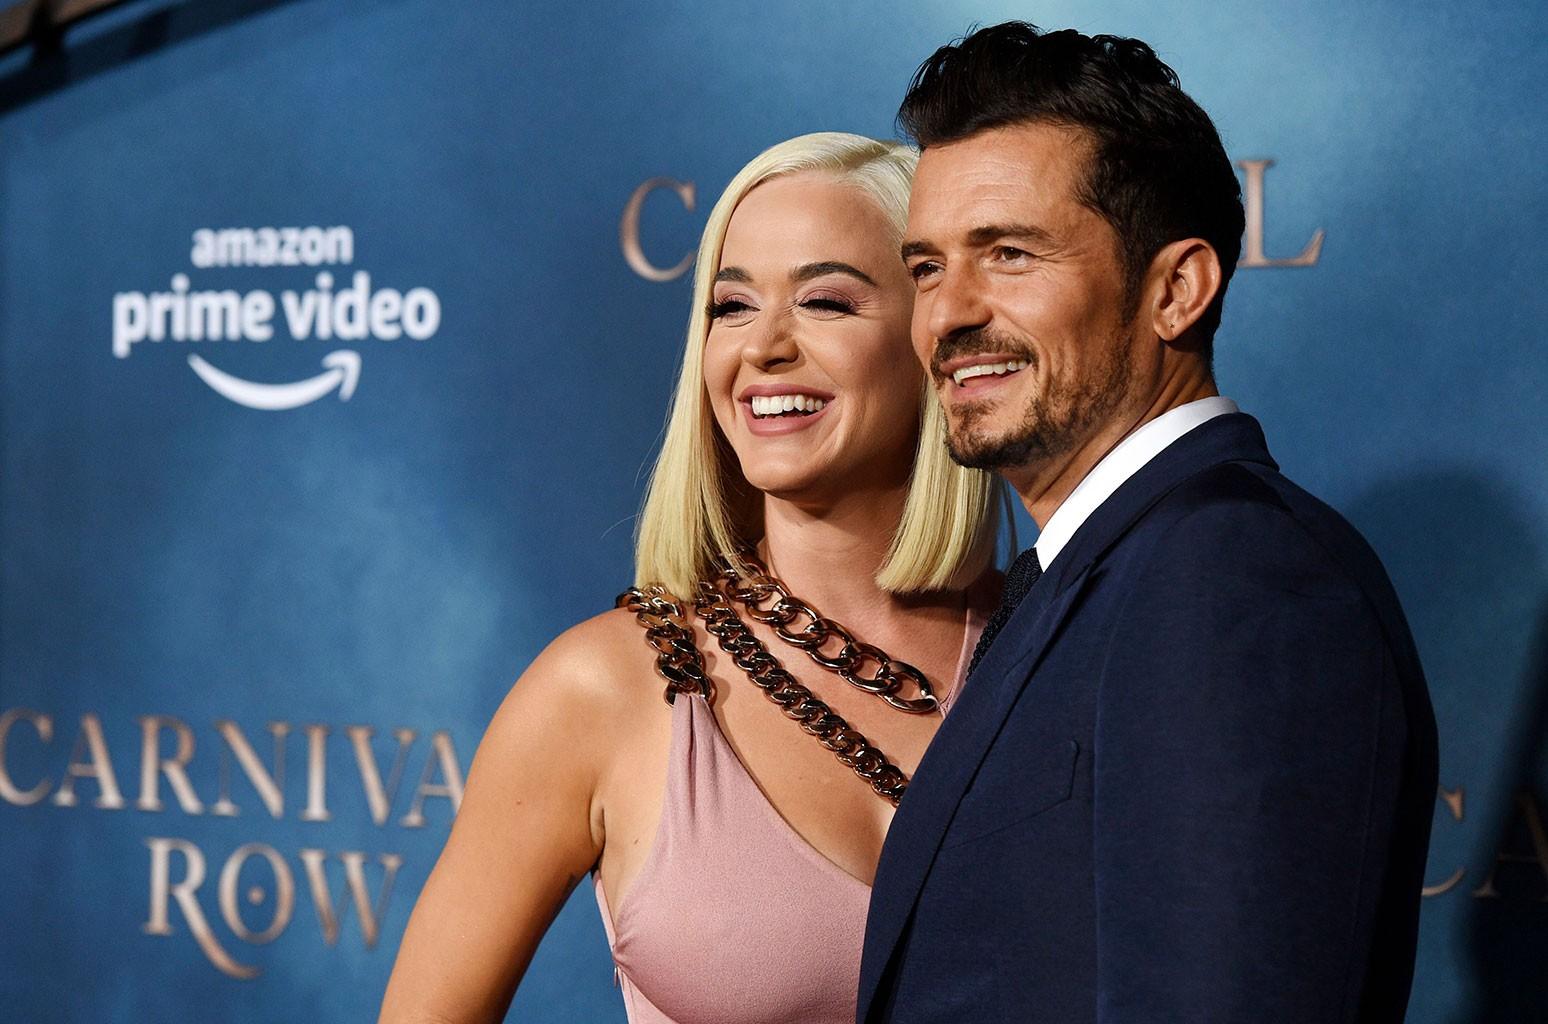 Katy Perry Trolls Orlando Bloom Over Italian Vacation Post